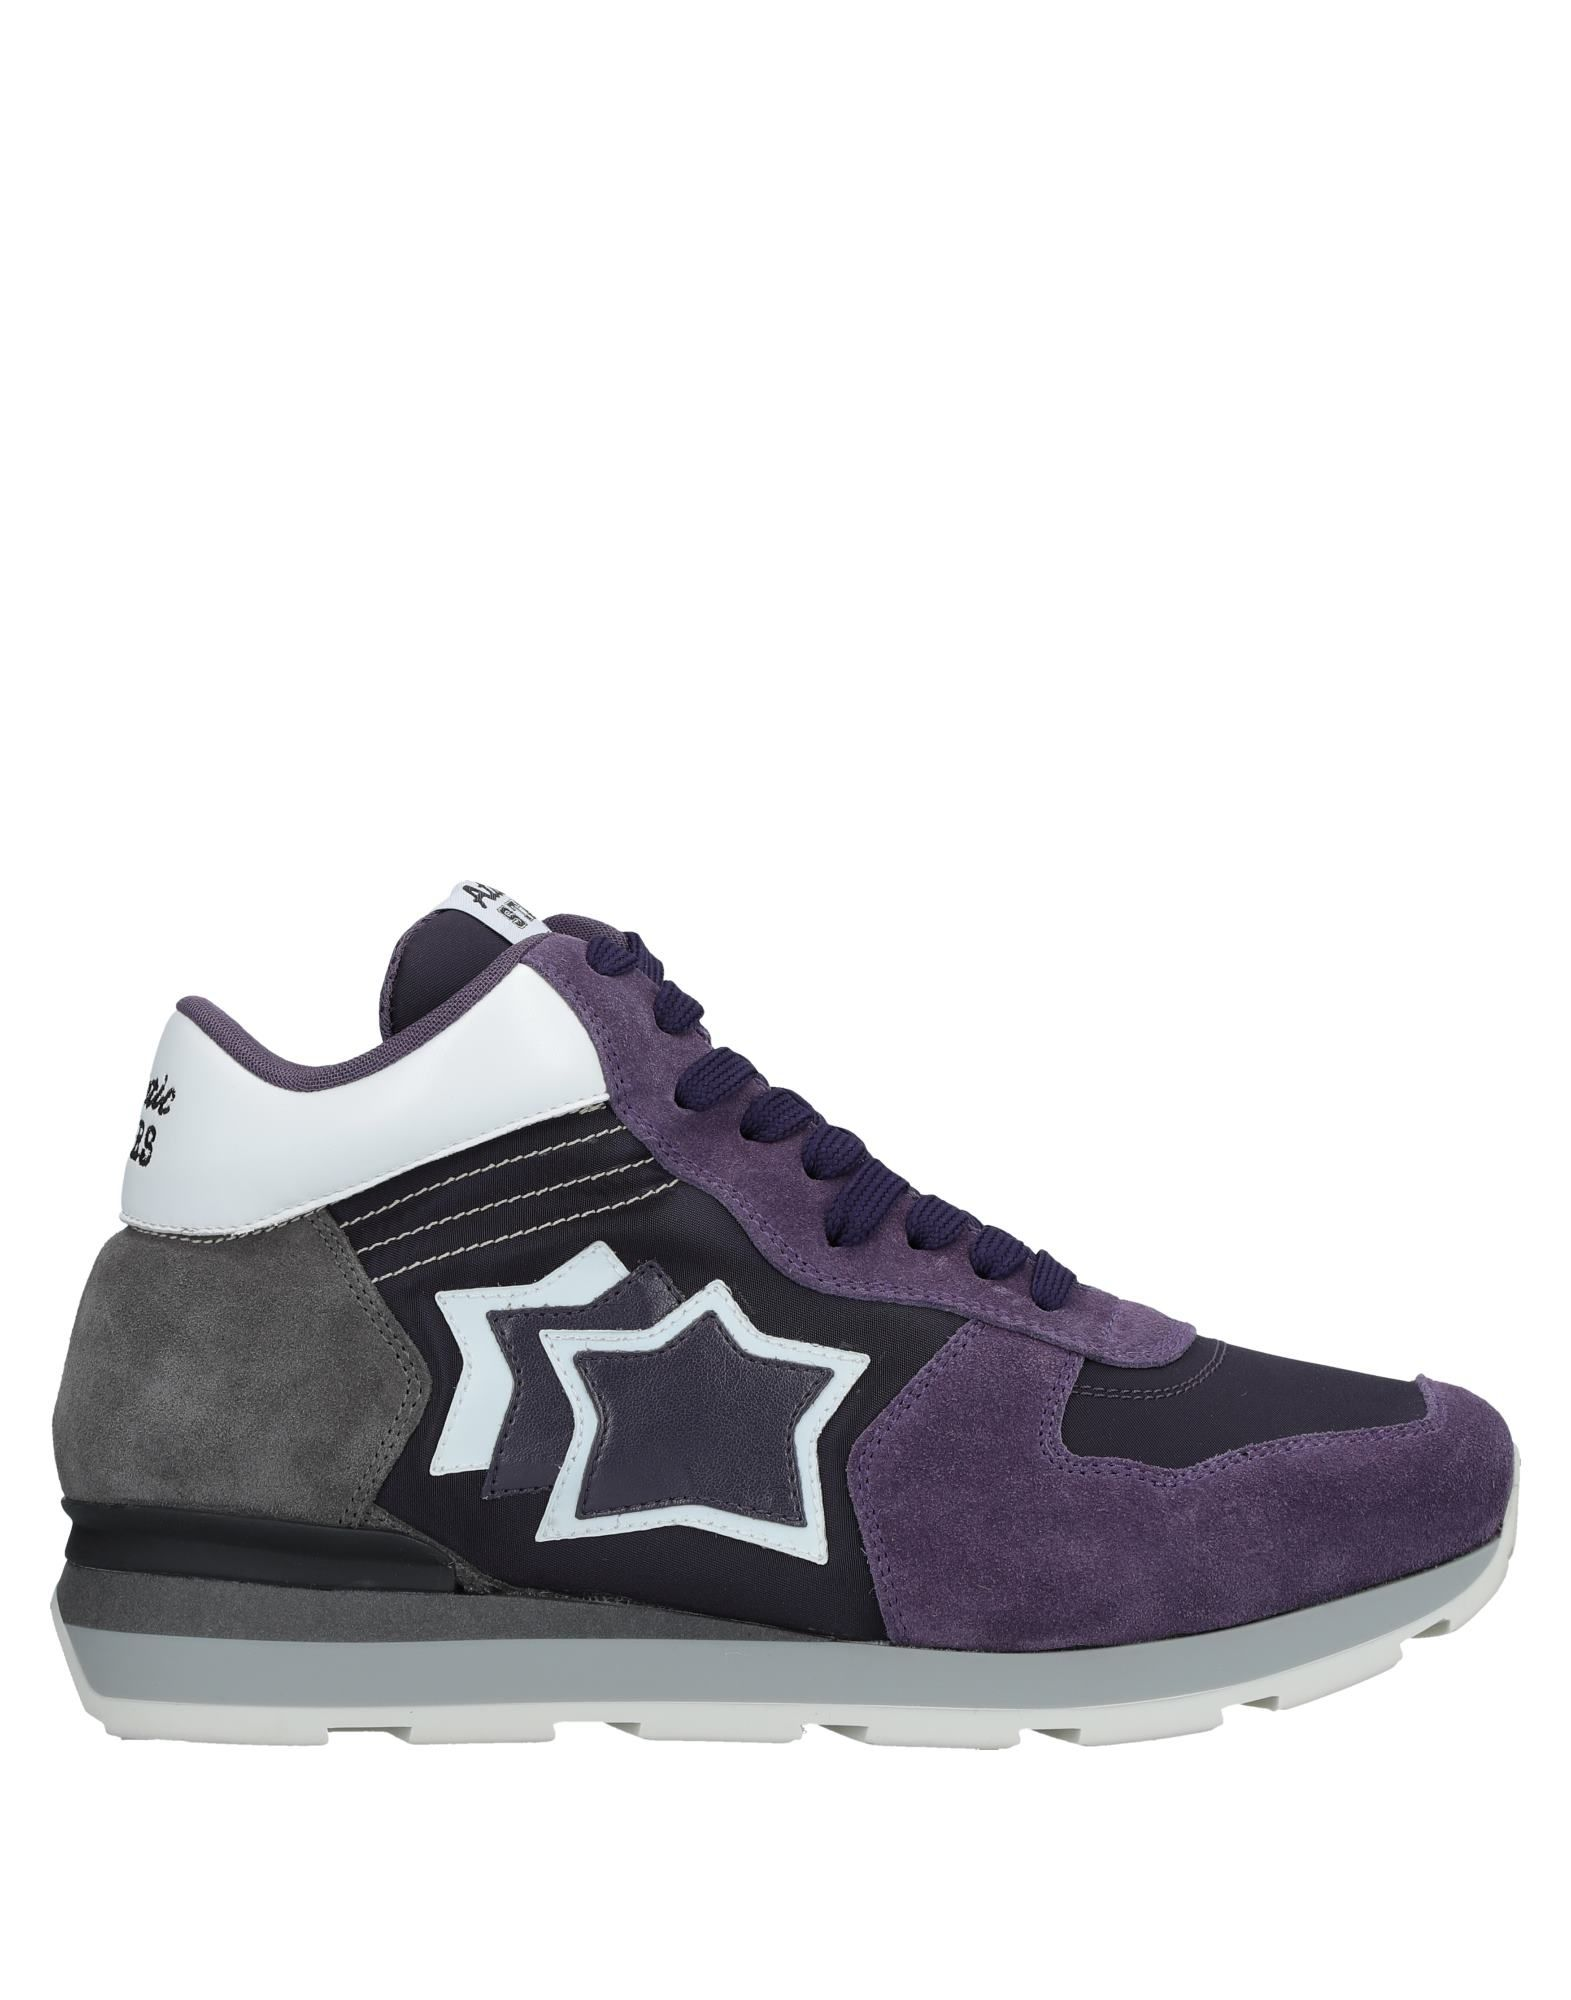 Sneakers Atlantic Stars Uomo - 11524840JK